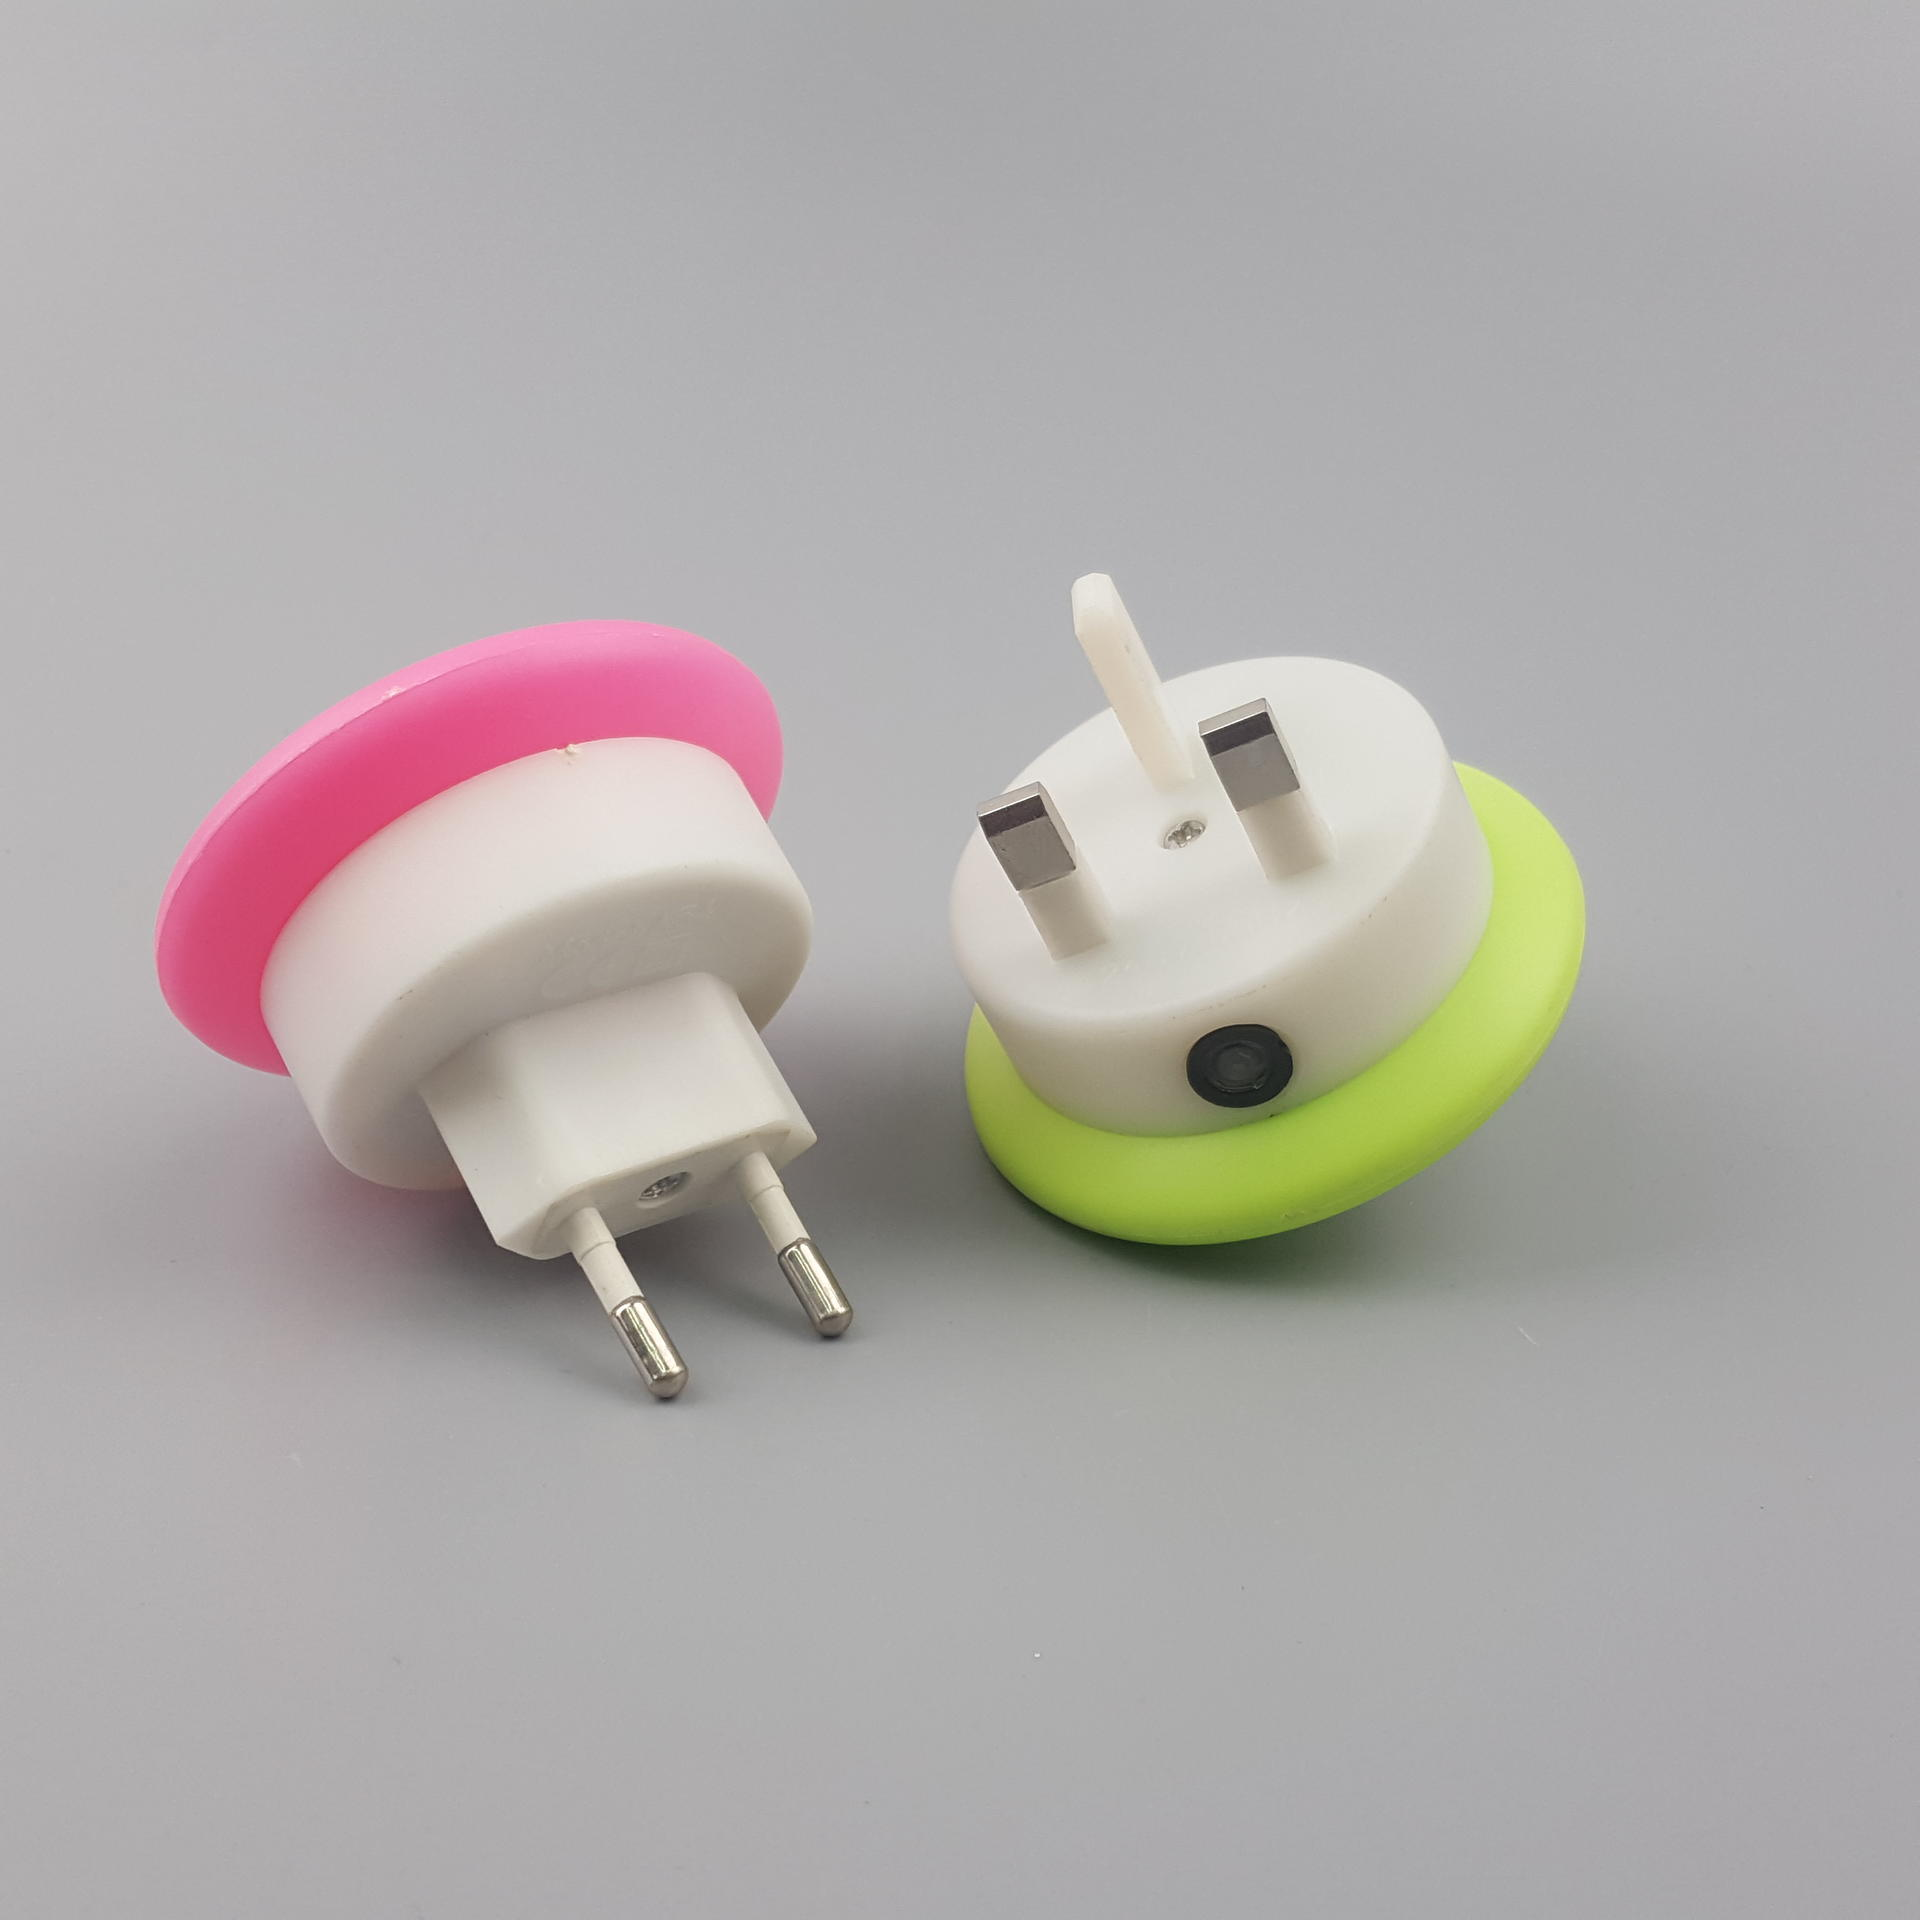 A54 OEMled sensor night light plug in sleep room CE ROHS BS 240V for baby kids